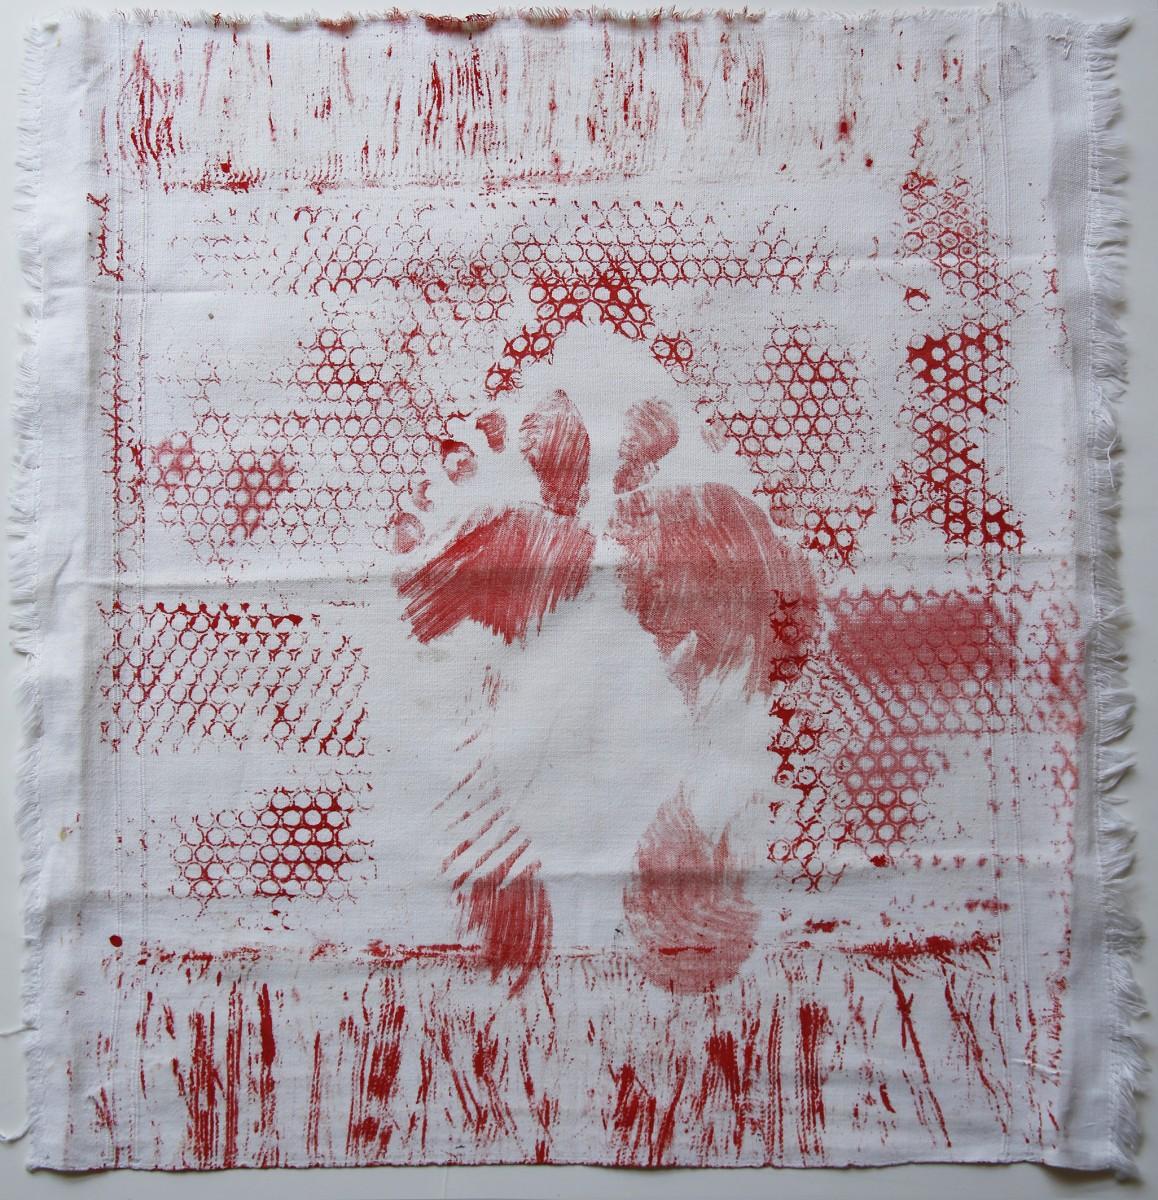 Maïmouna Guerresi, Red carpet, 2015